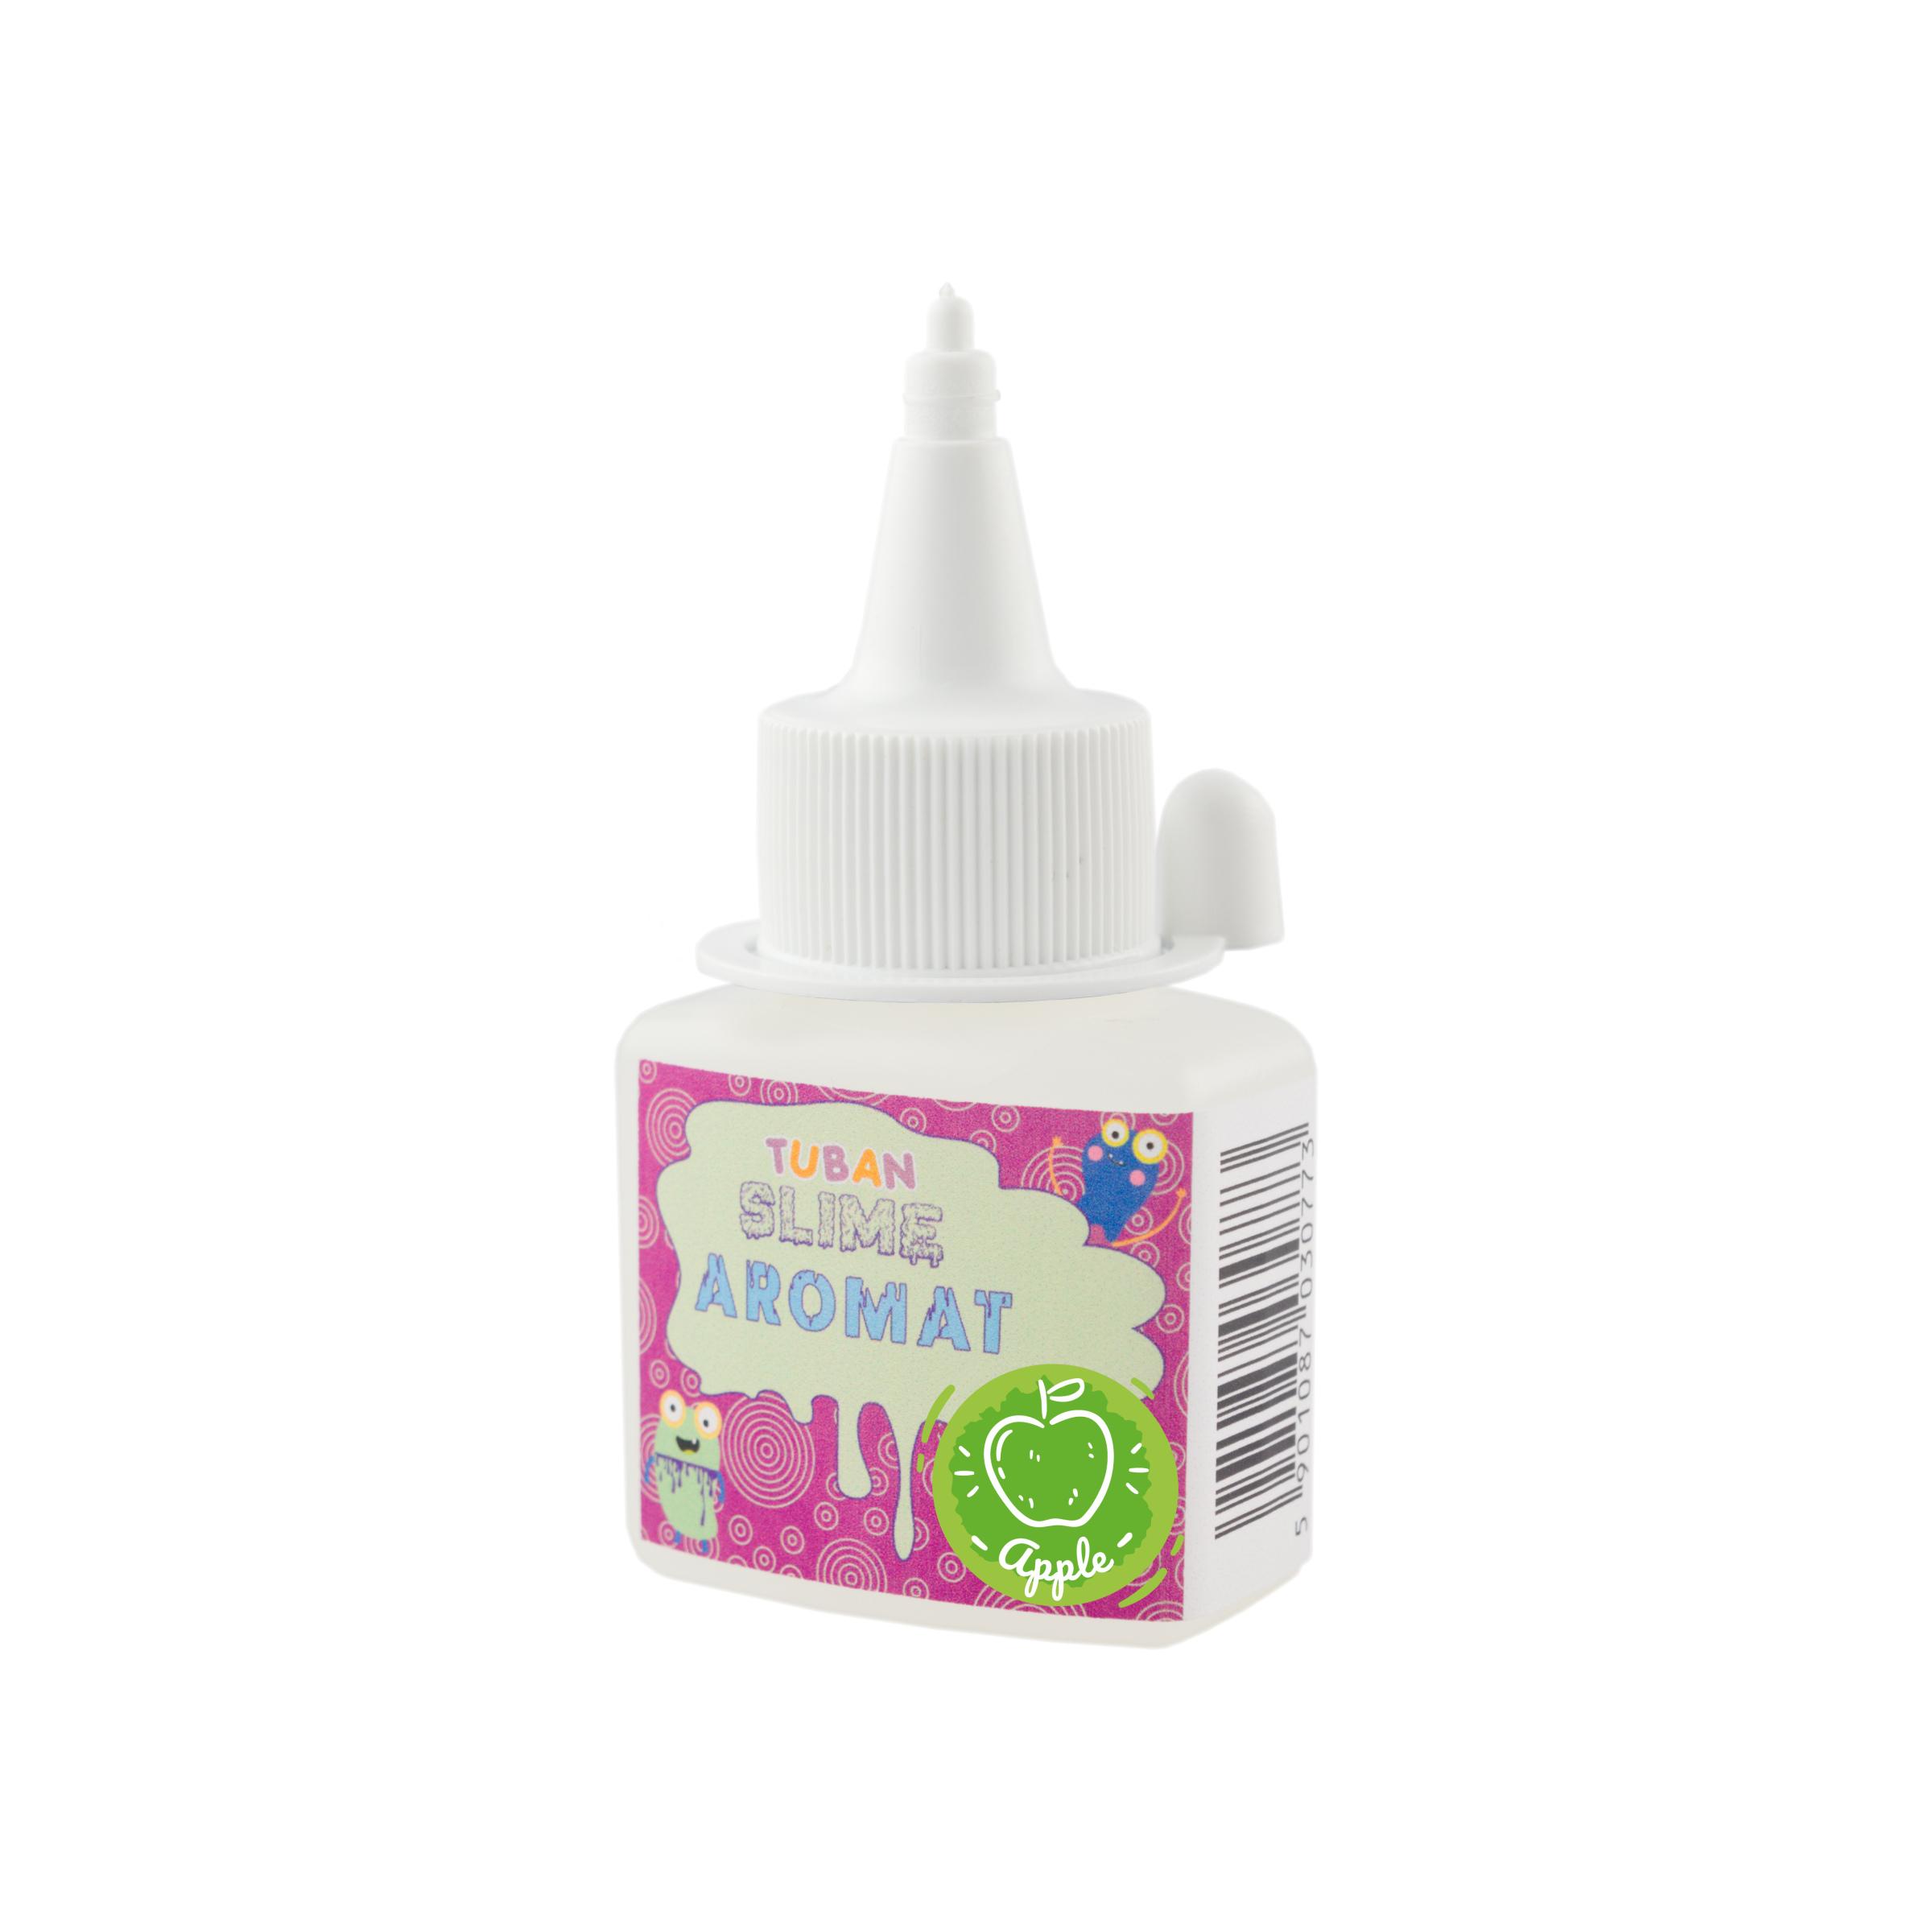 Tuban - Super Slime - Aroma mit Apfelduft - 35 ml - by Jablka